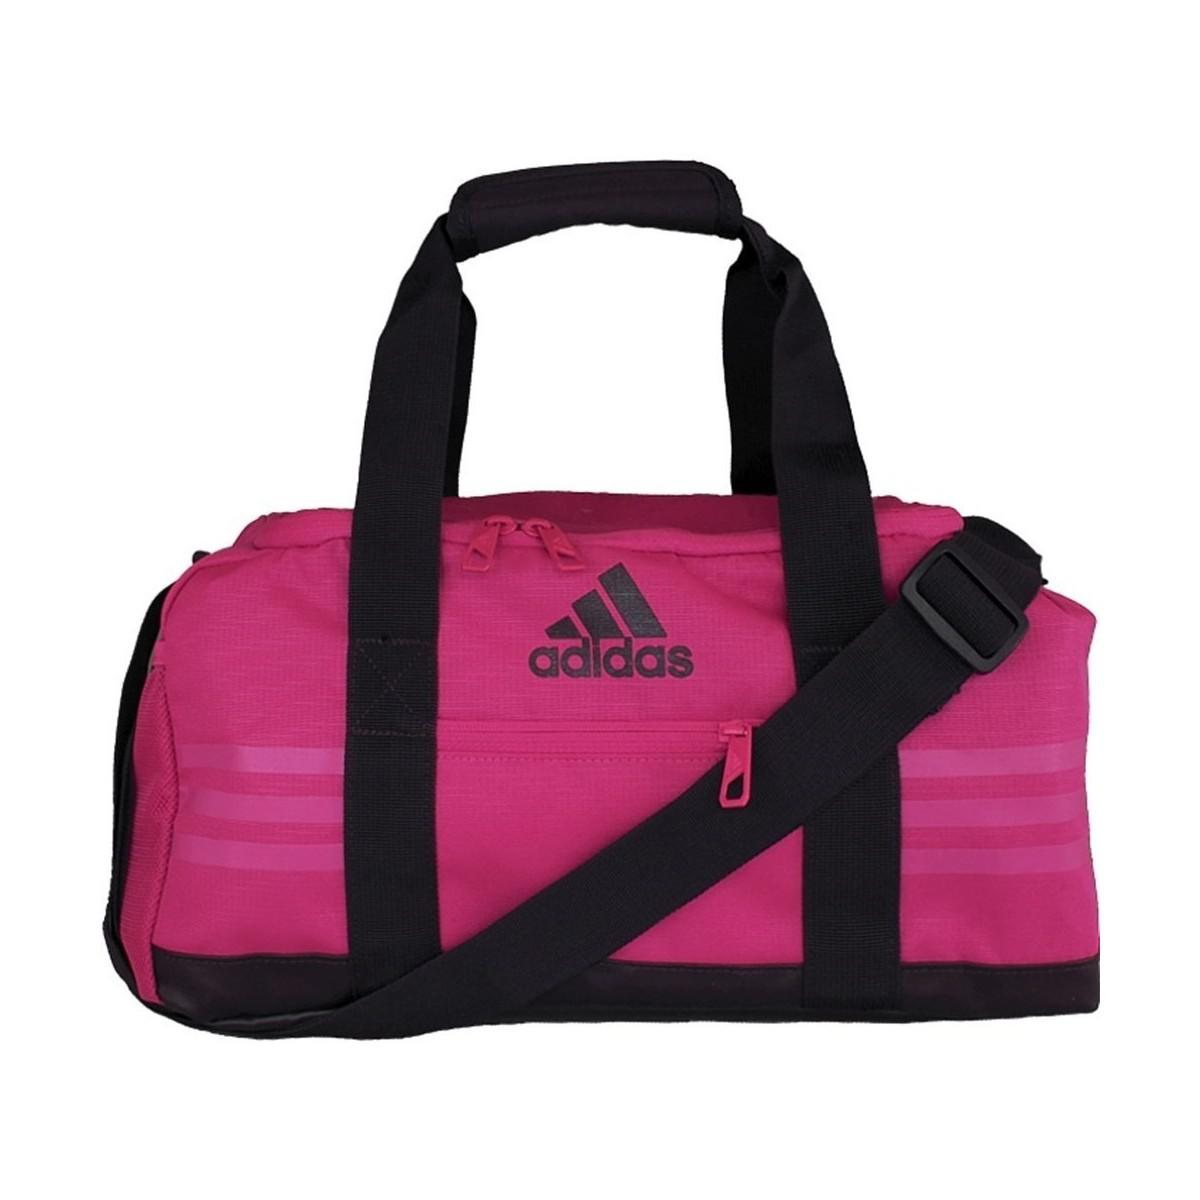 9280f936f8 Adidas - 3 Stripes Performance Teambag Xs Men s Sports Bag In Black for Men  - Lyst